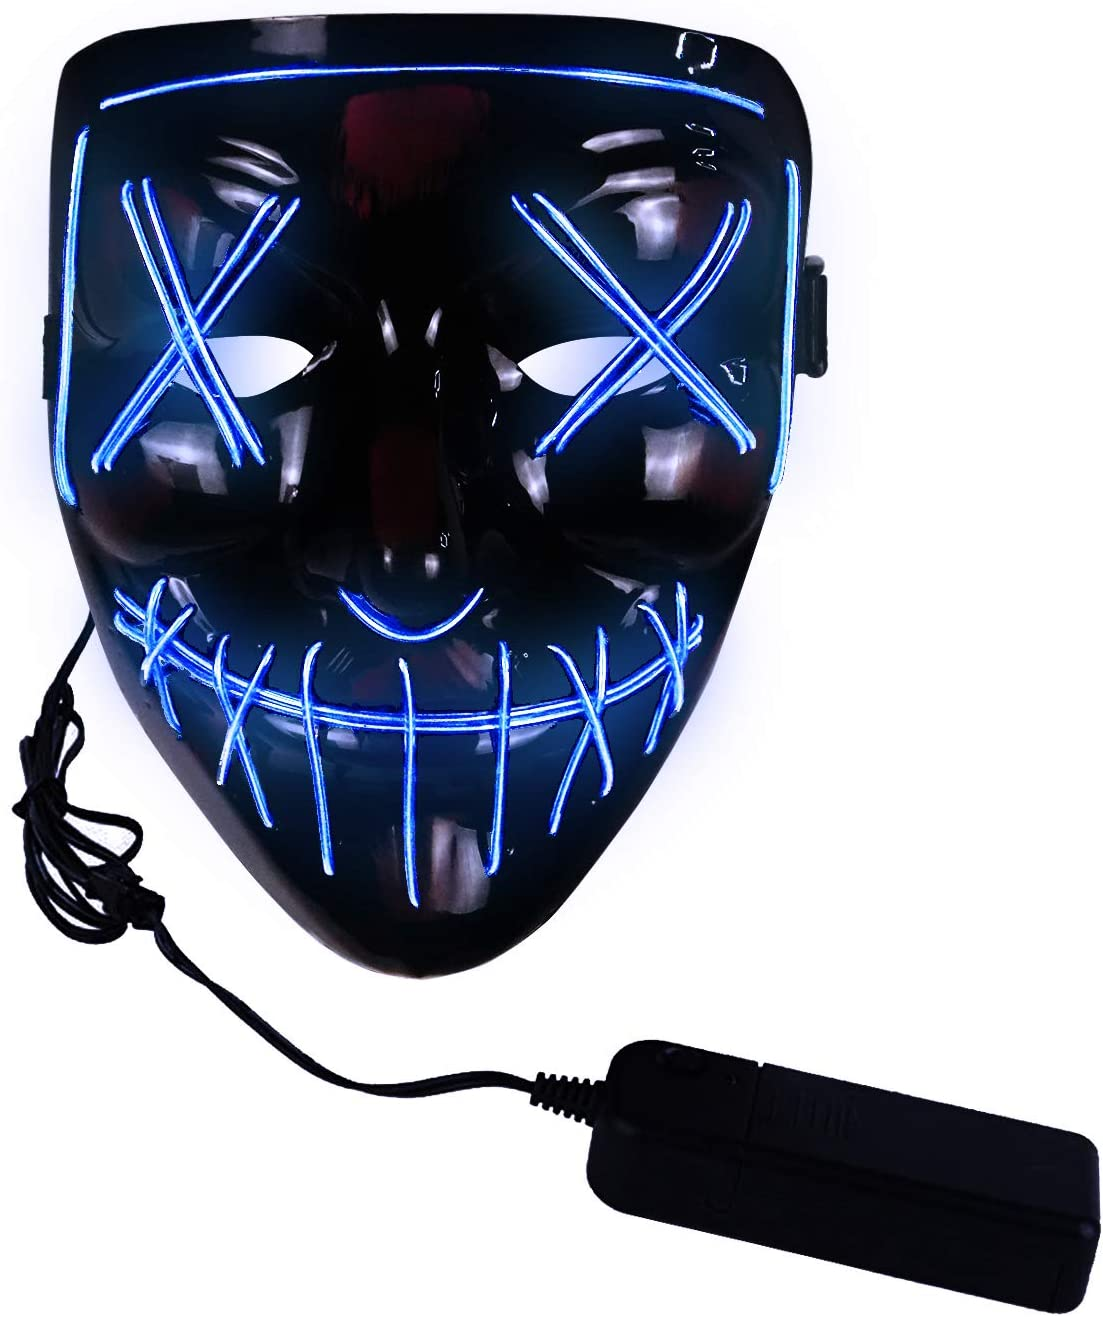 molezu LED Light Up Scary Mask, Novelty Halloween Costume Party Creepy Props, Safe EL Wire PVC DJs Mask Blue LED